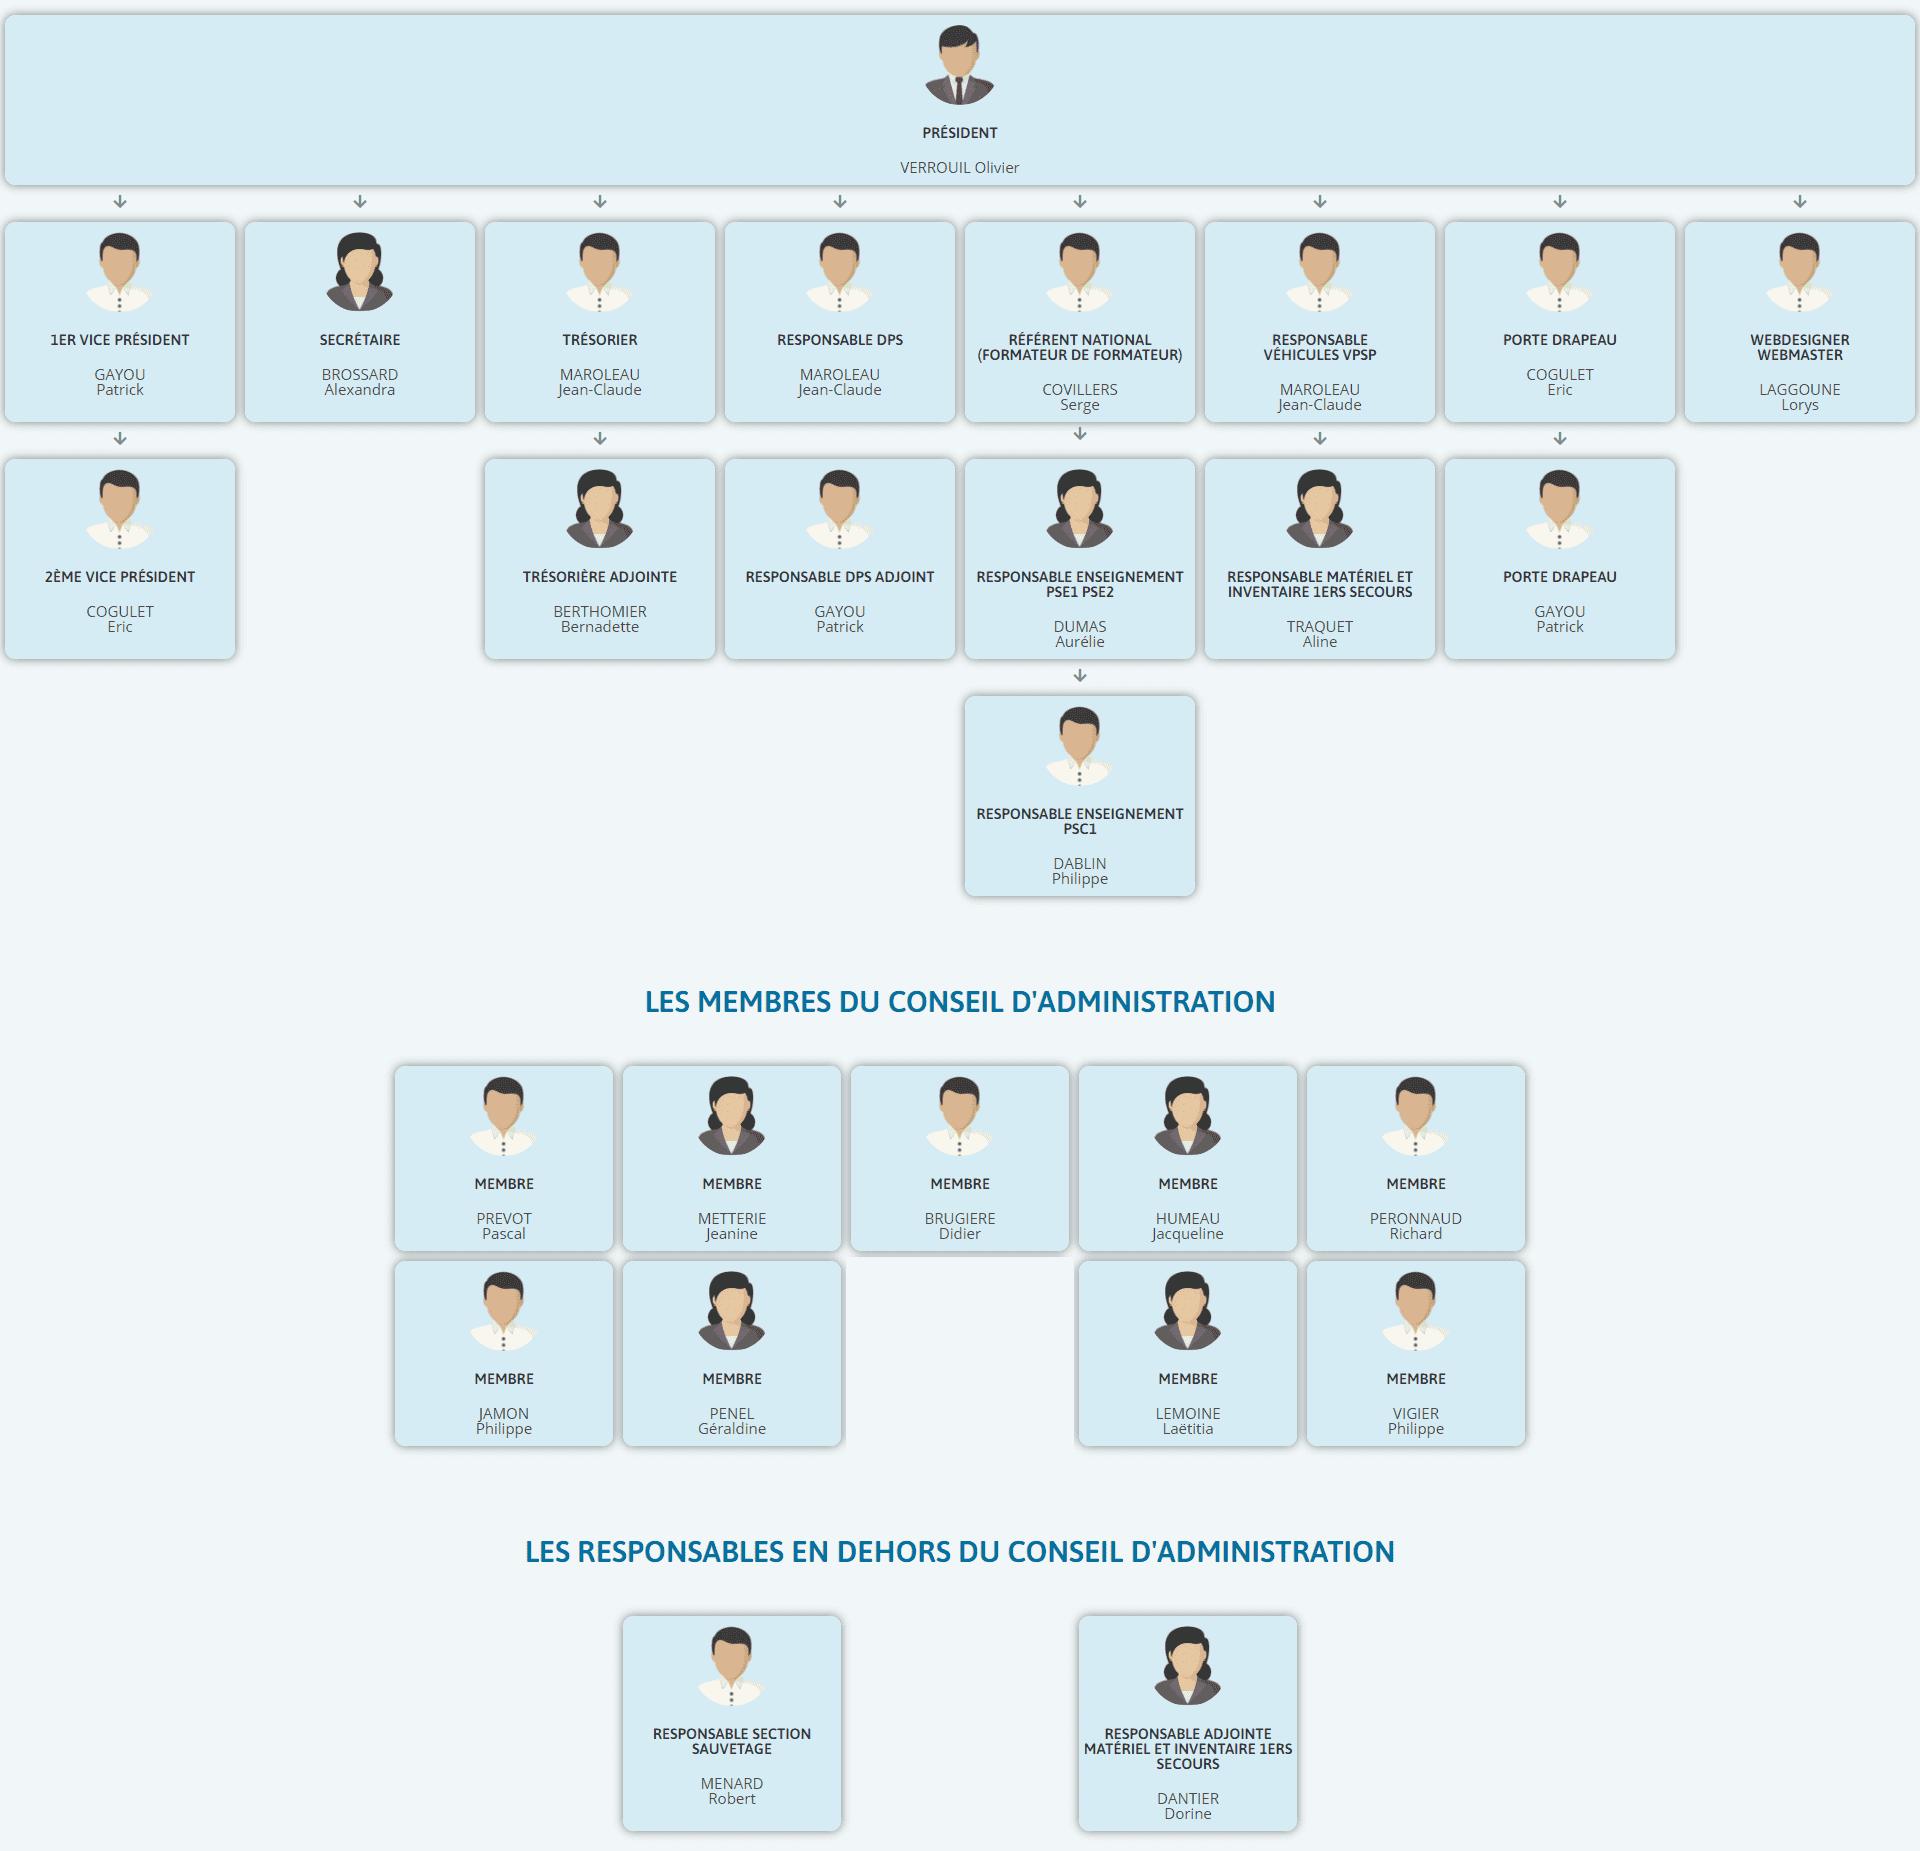 organigramme-2021_conseil_administration